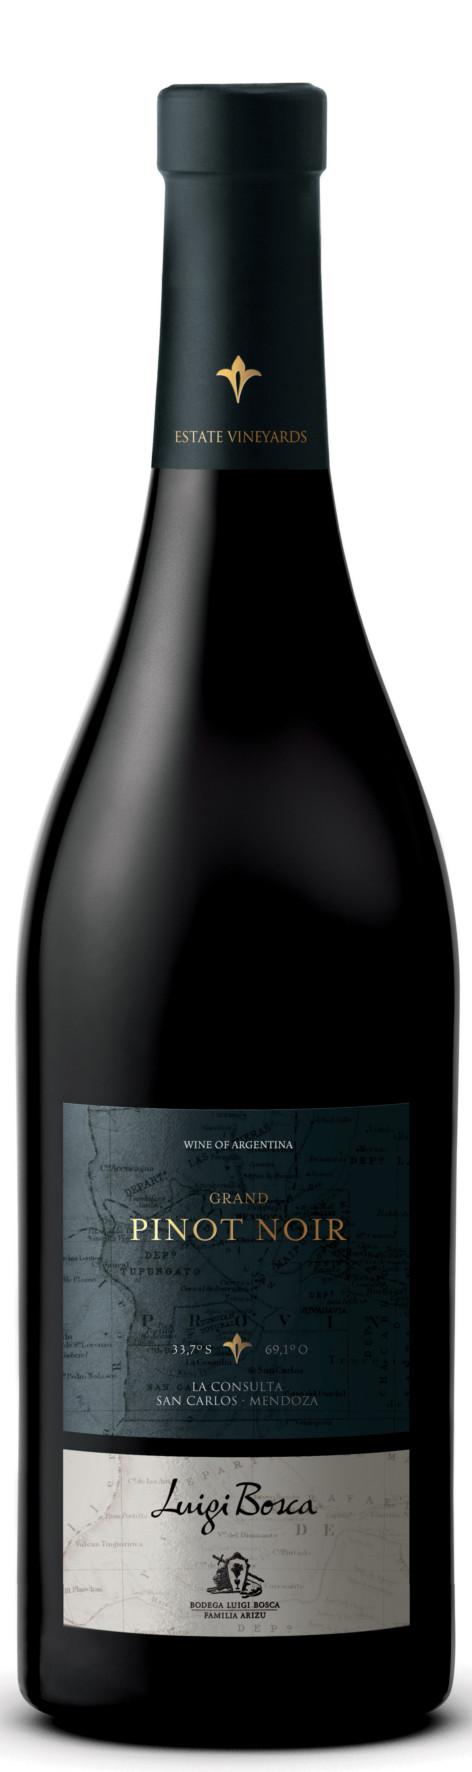 Grand Pinot Noir Luigi Bosca